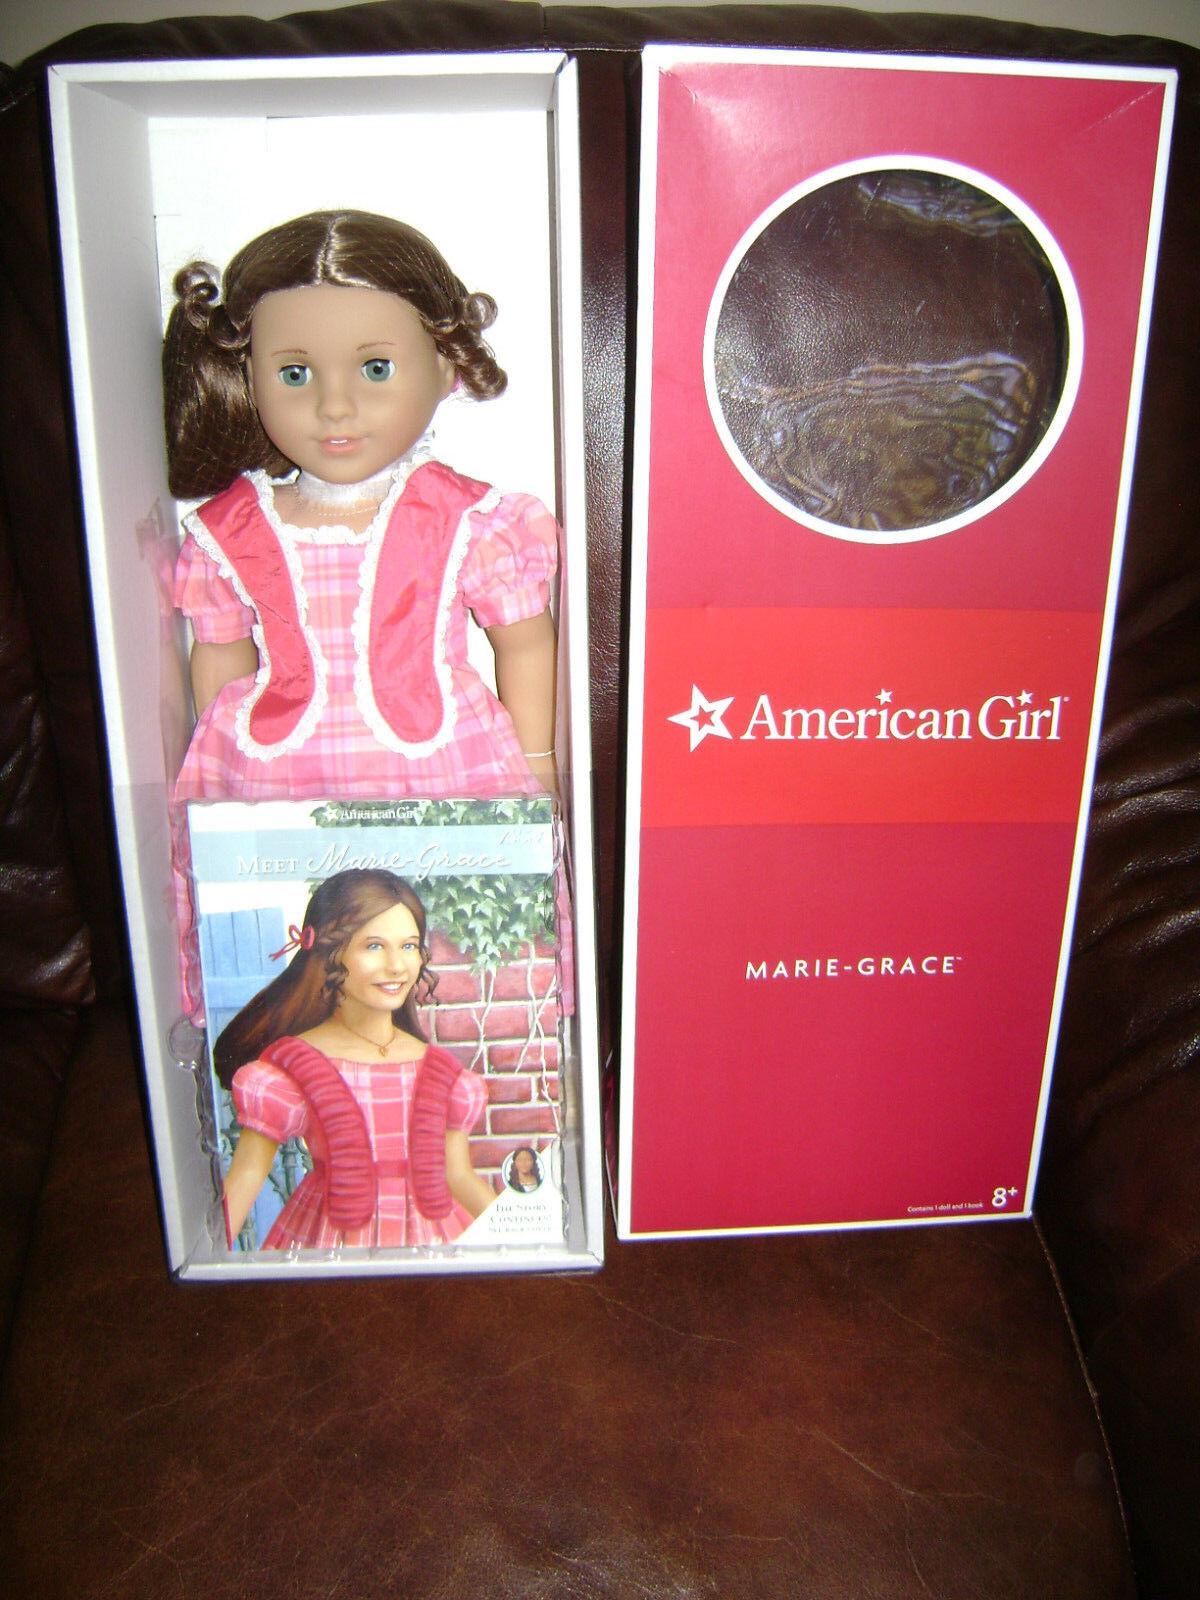 AMERICAN GIRL HISTORICAL DOLL 18  MARIE GRACE  Book friend of CECILE RETIrot NIB